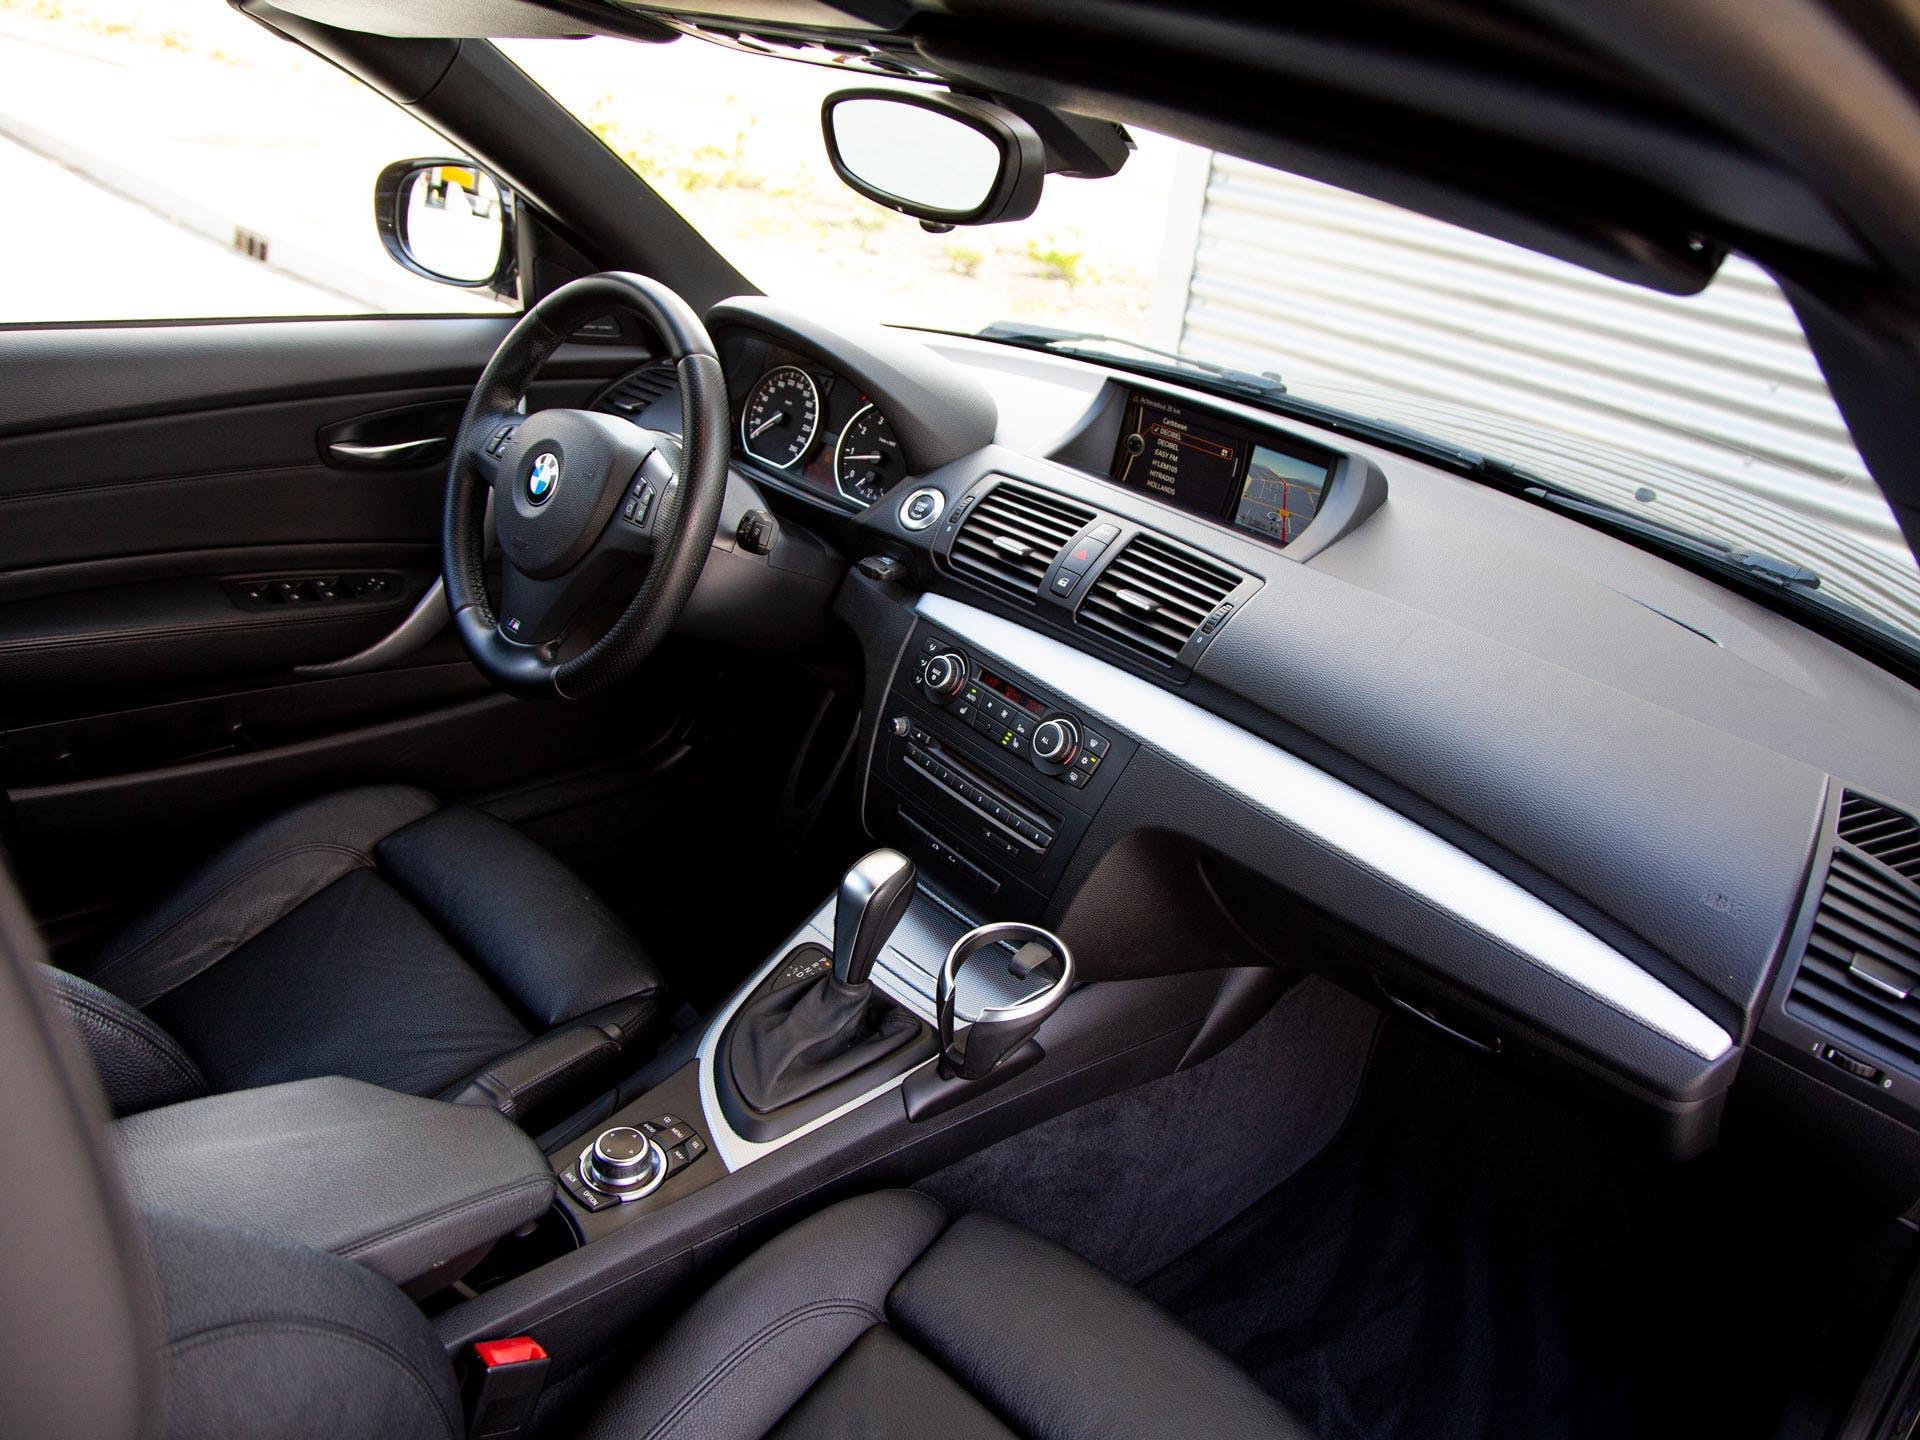 Tweedehands BMW 1 Serie Cabrio occasion